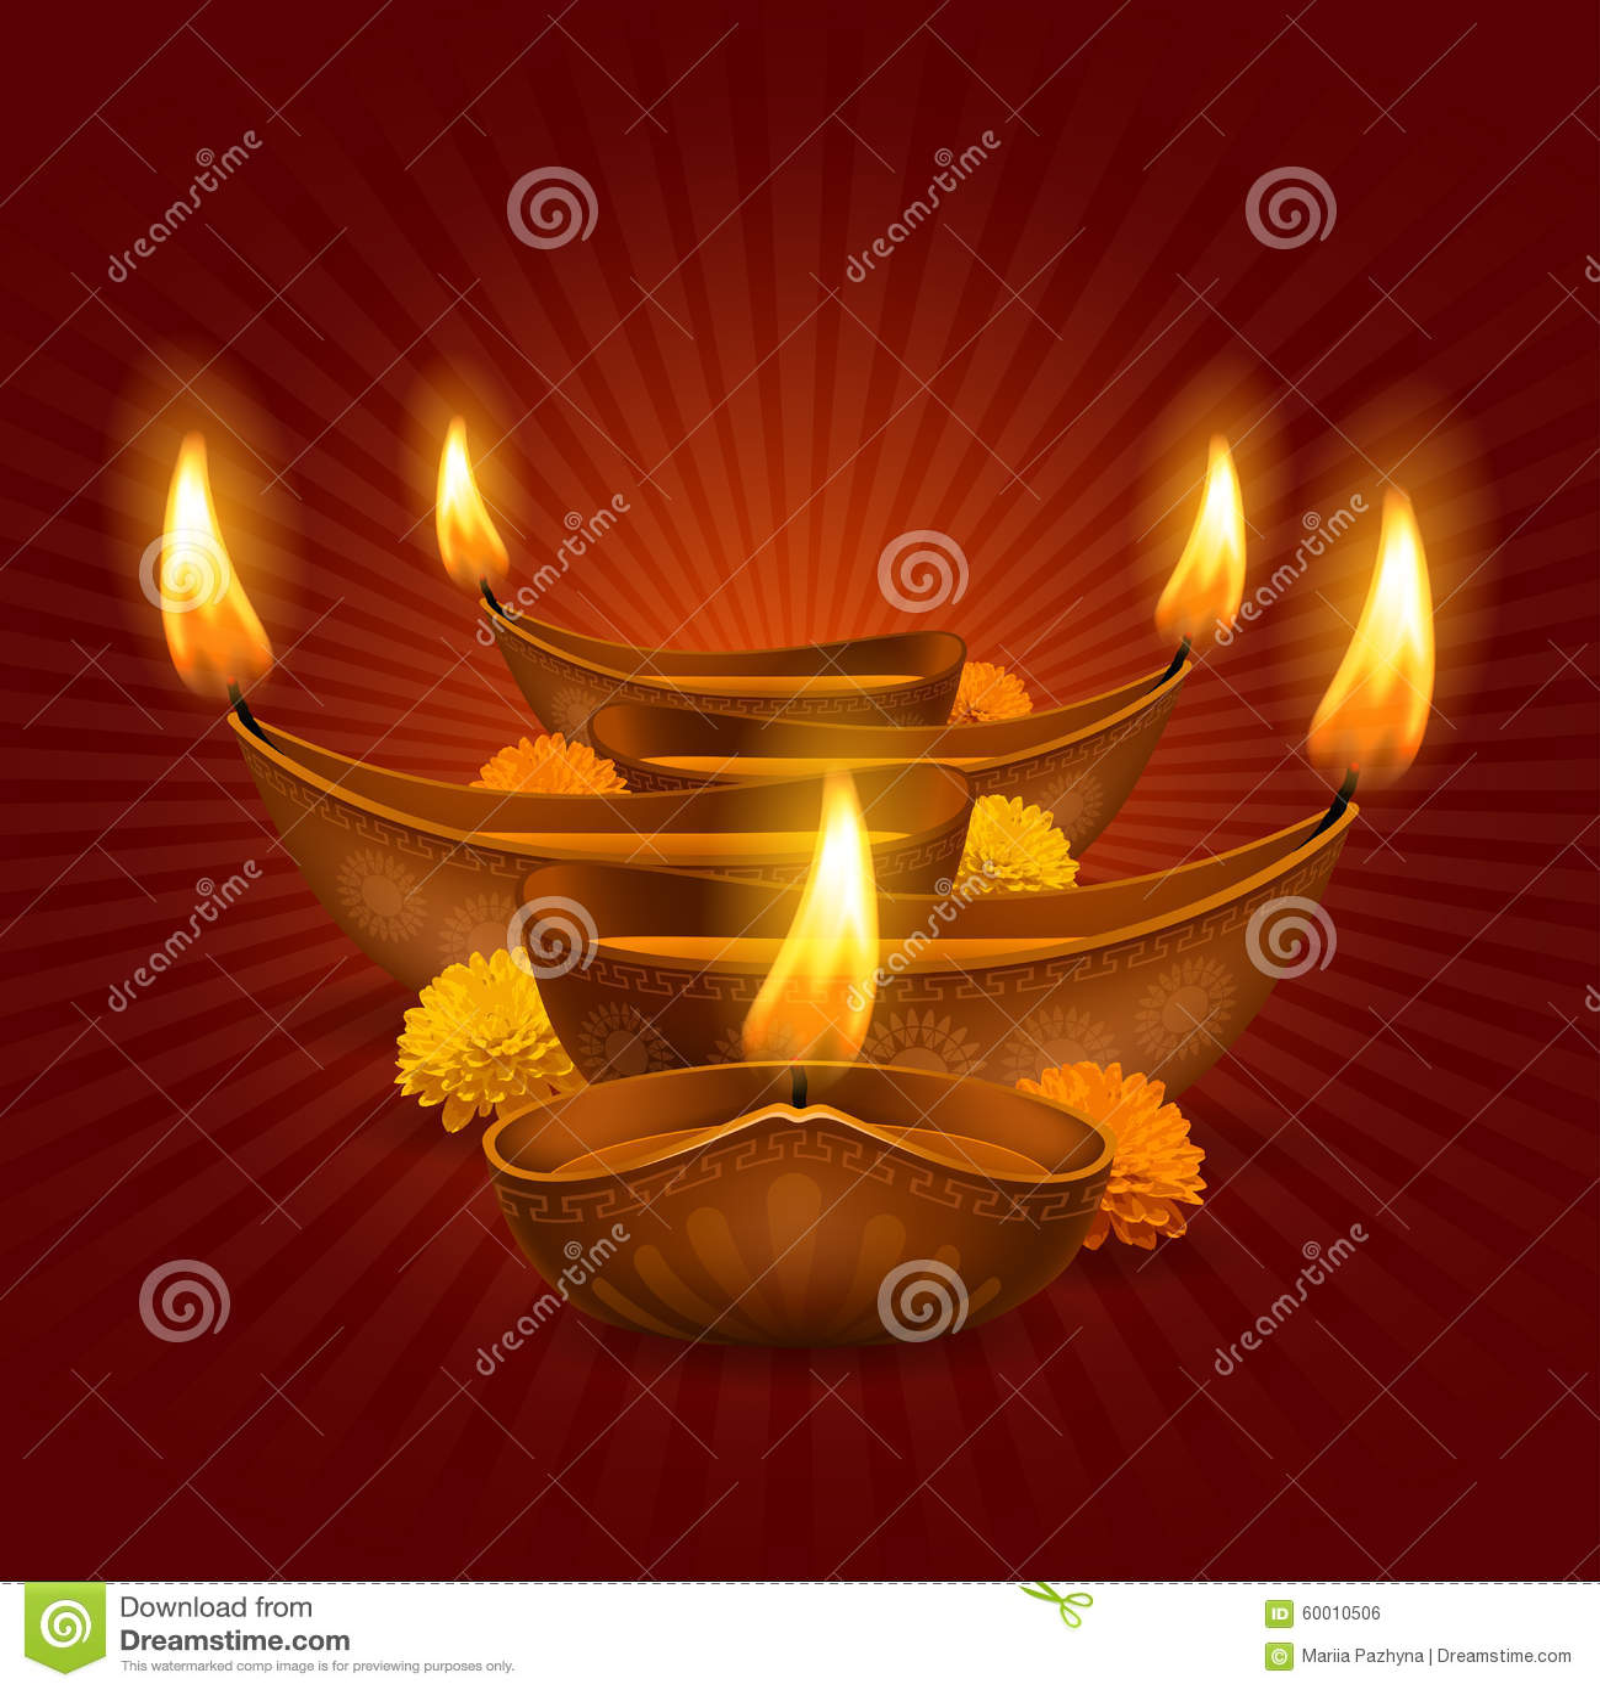 Animated Burning Lamp Oil : Happy diwali stock vector illustration of